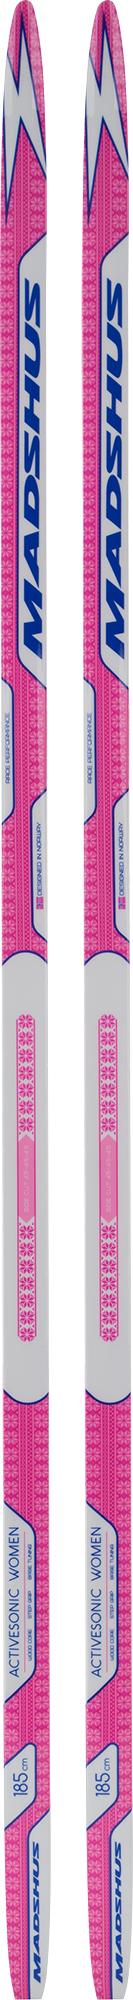 Madshus Беговые лыжи женские Madshus Activesonic беговые лыжи tisa 90515 top universal 197